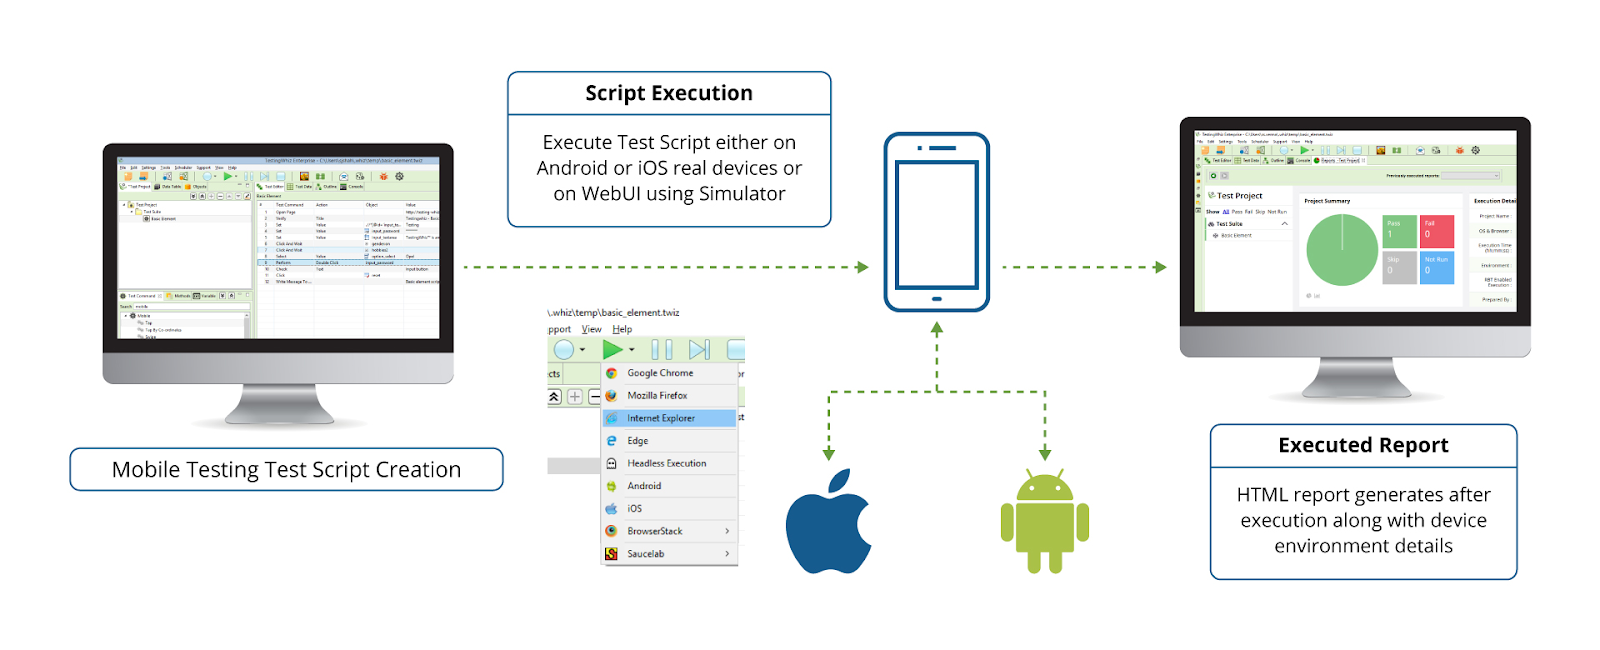 mobile-testing-script-creation